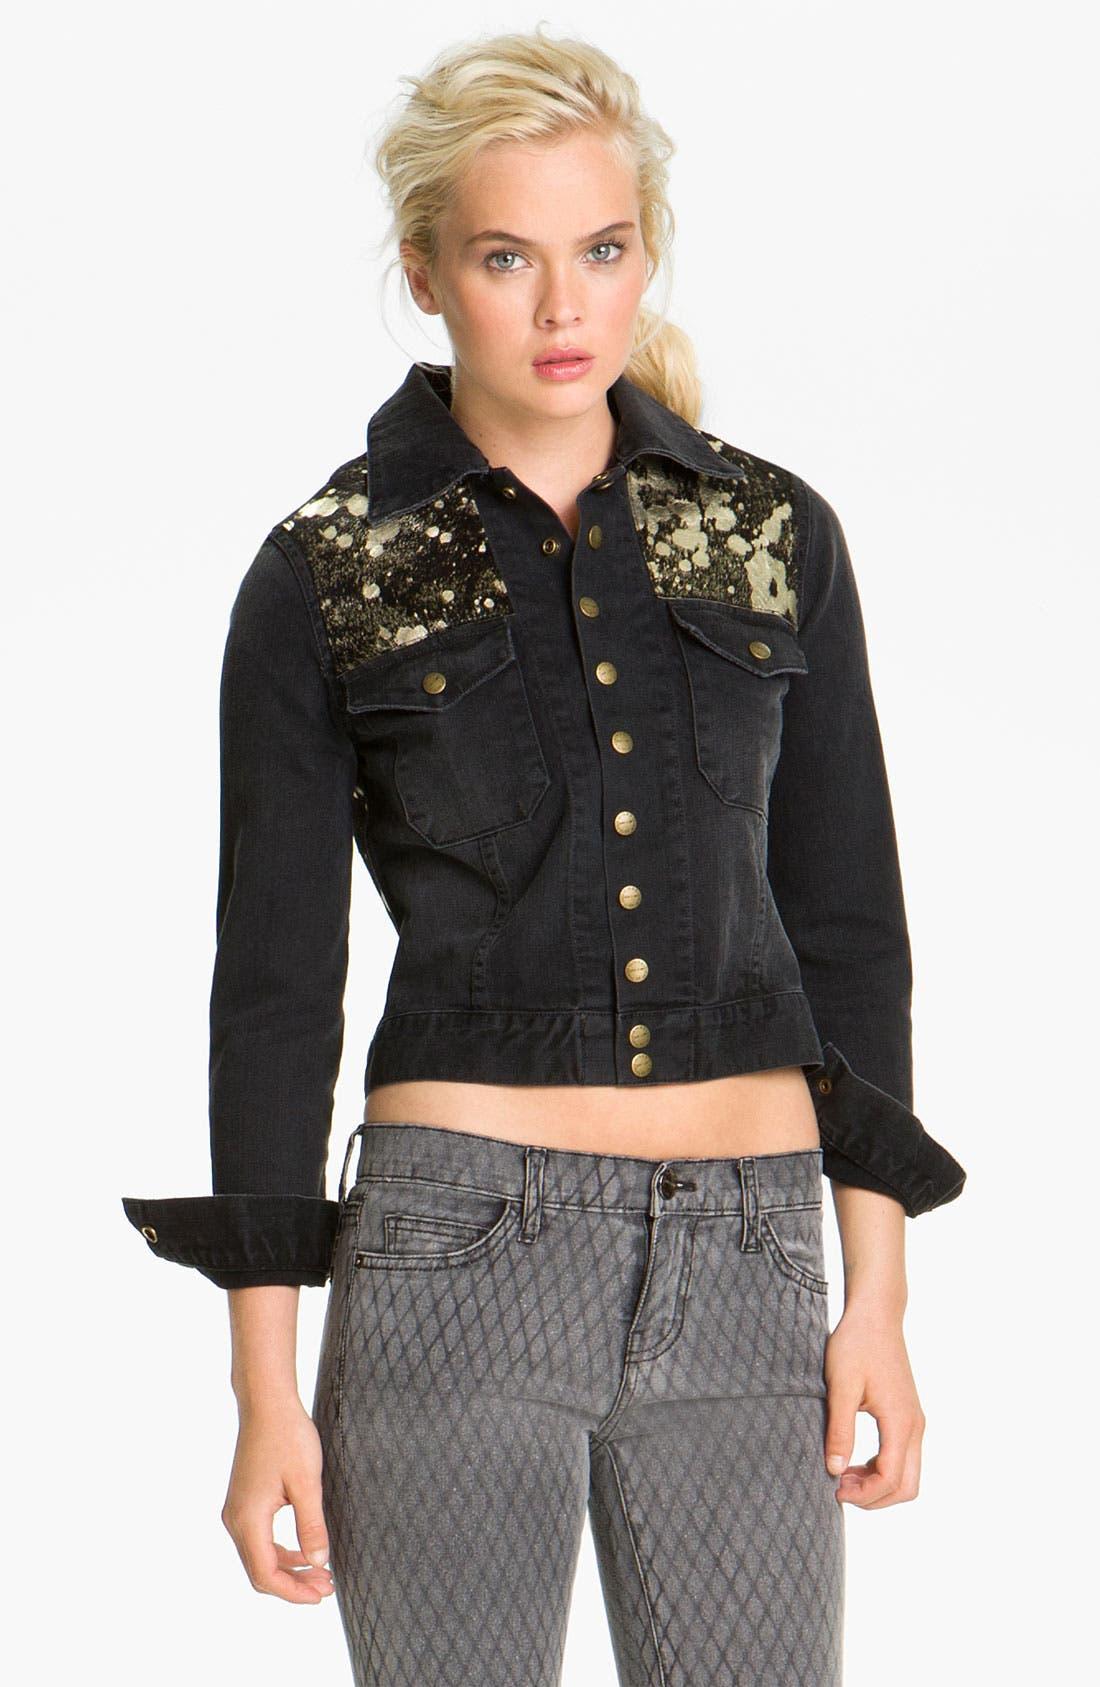 Alternate Image 1 Selected - Current/Elliott 'The Snap' Metallic Leather & Denim Jacket